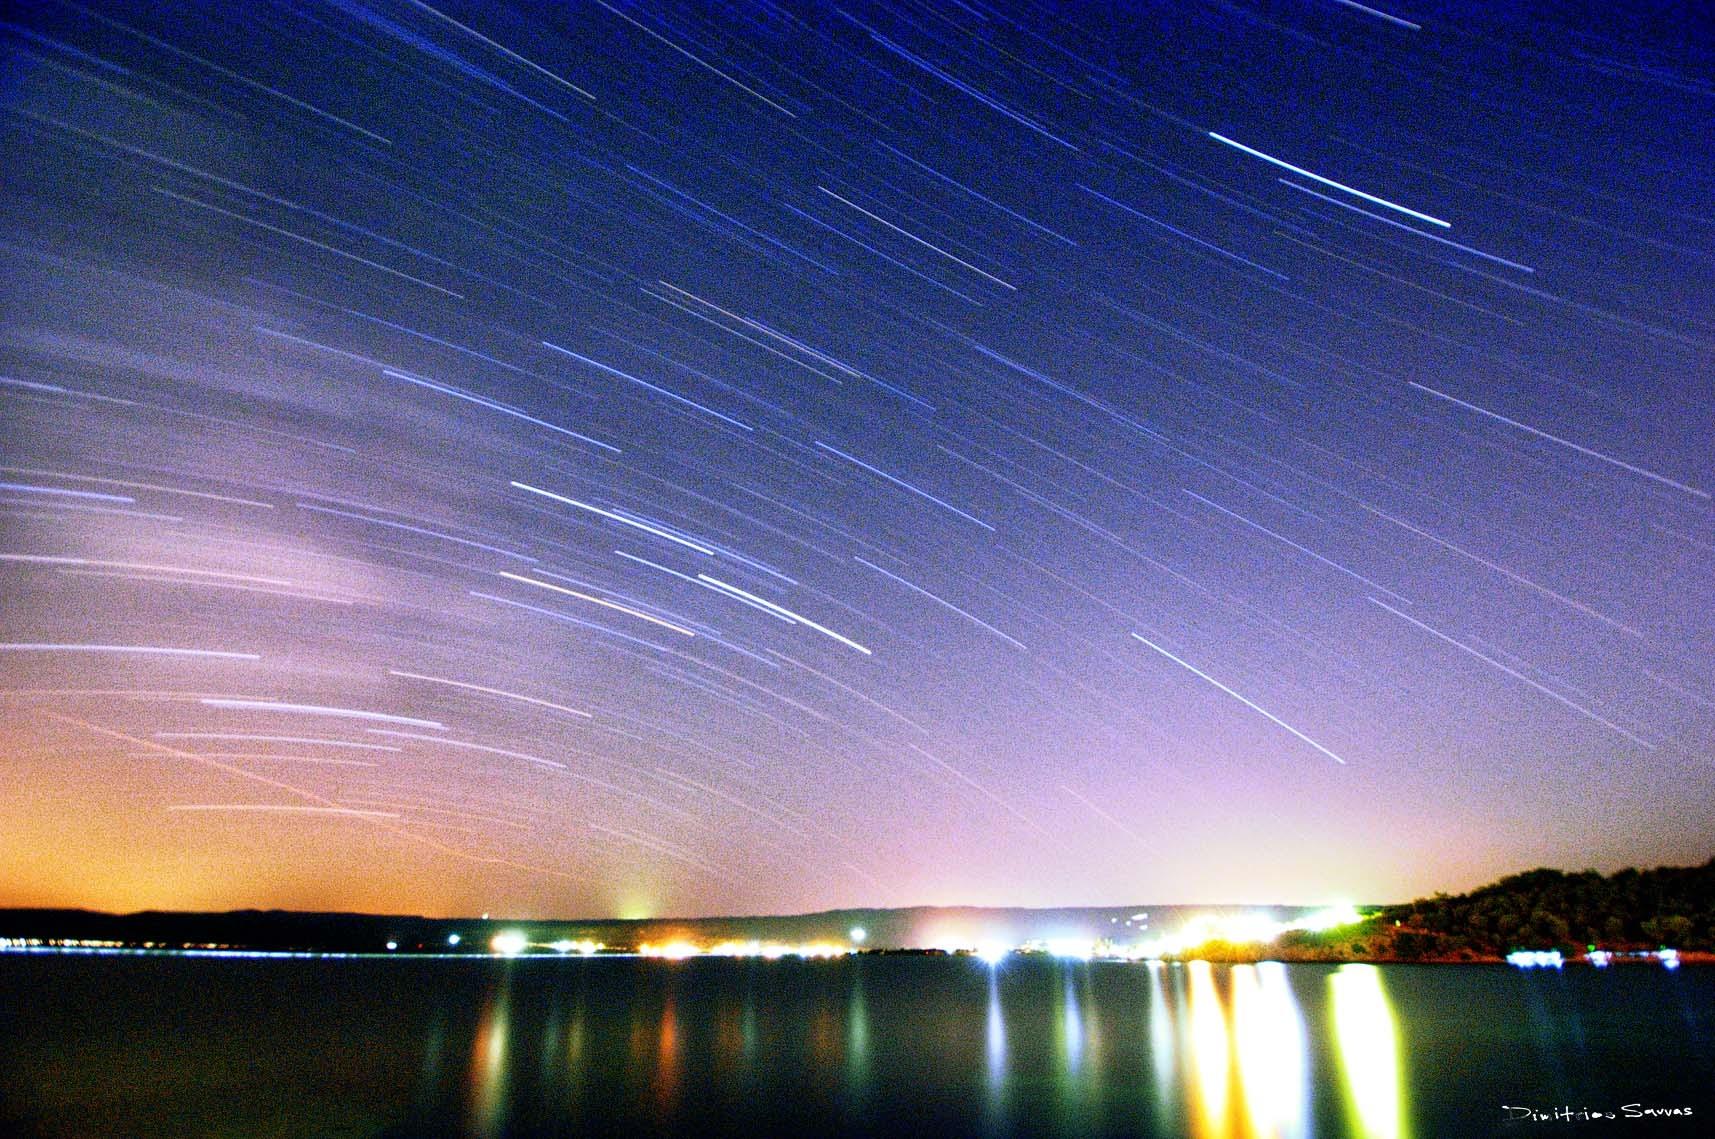 star trail by dimitrissavvas